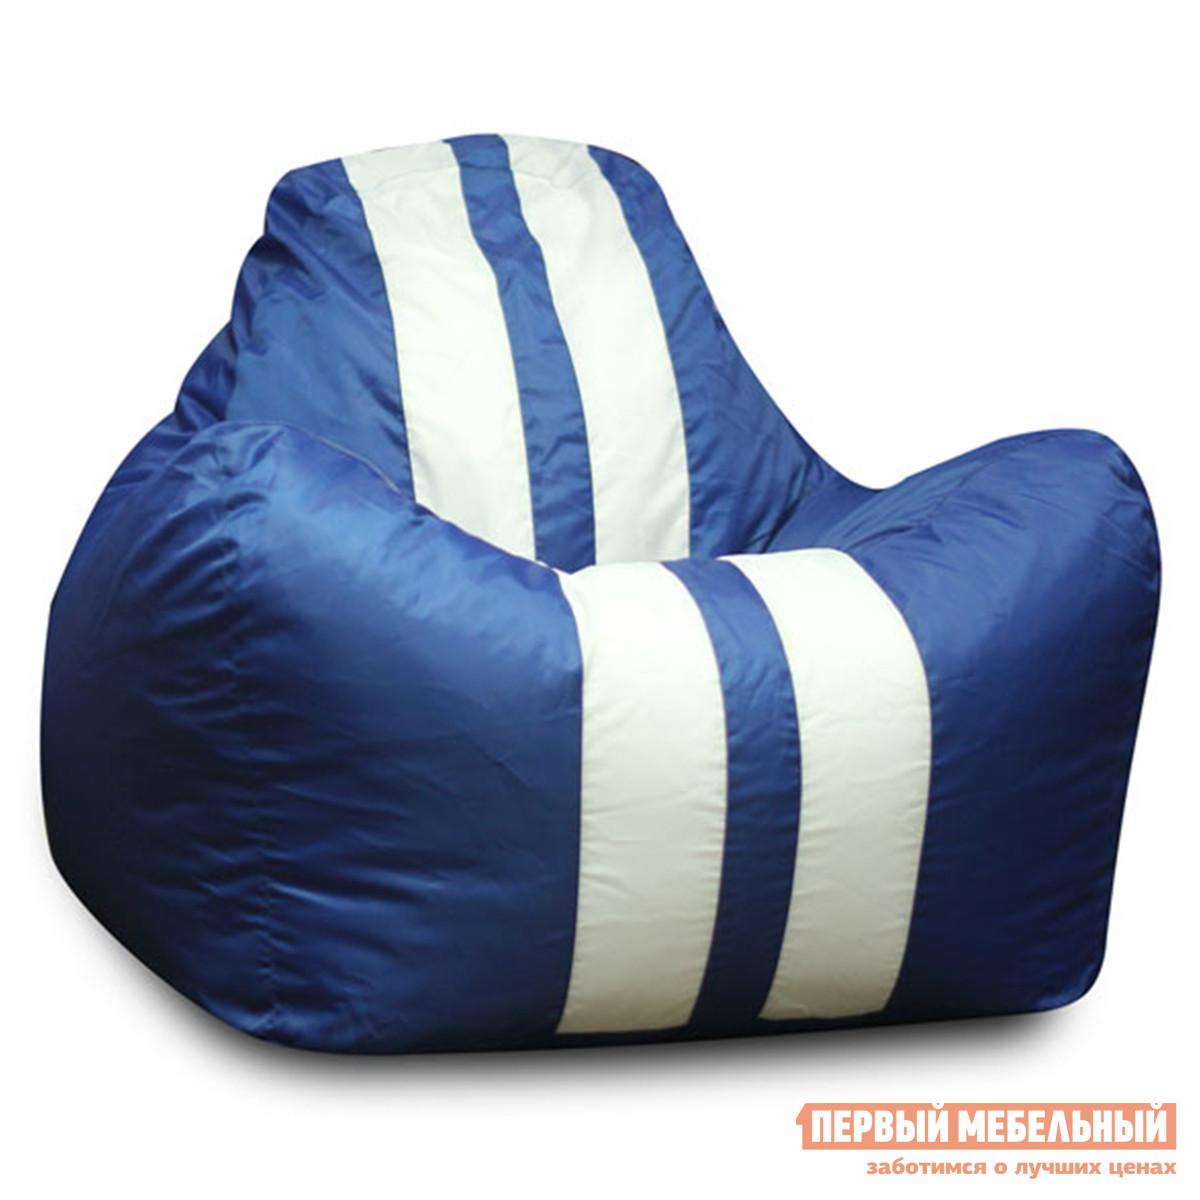 Кресло-мешок DreamBag Спорт